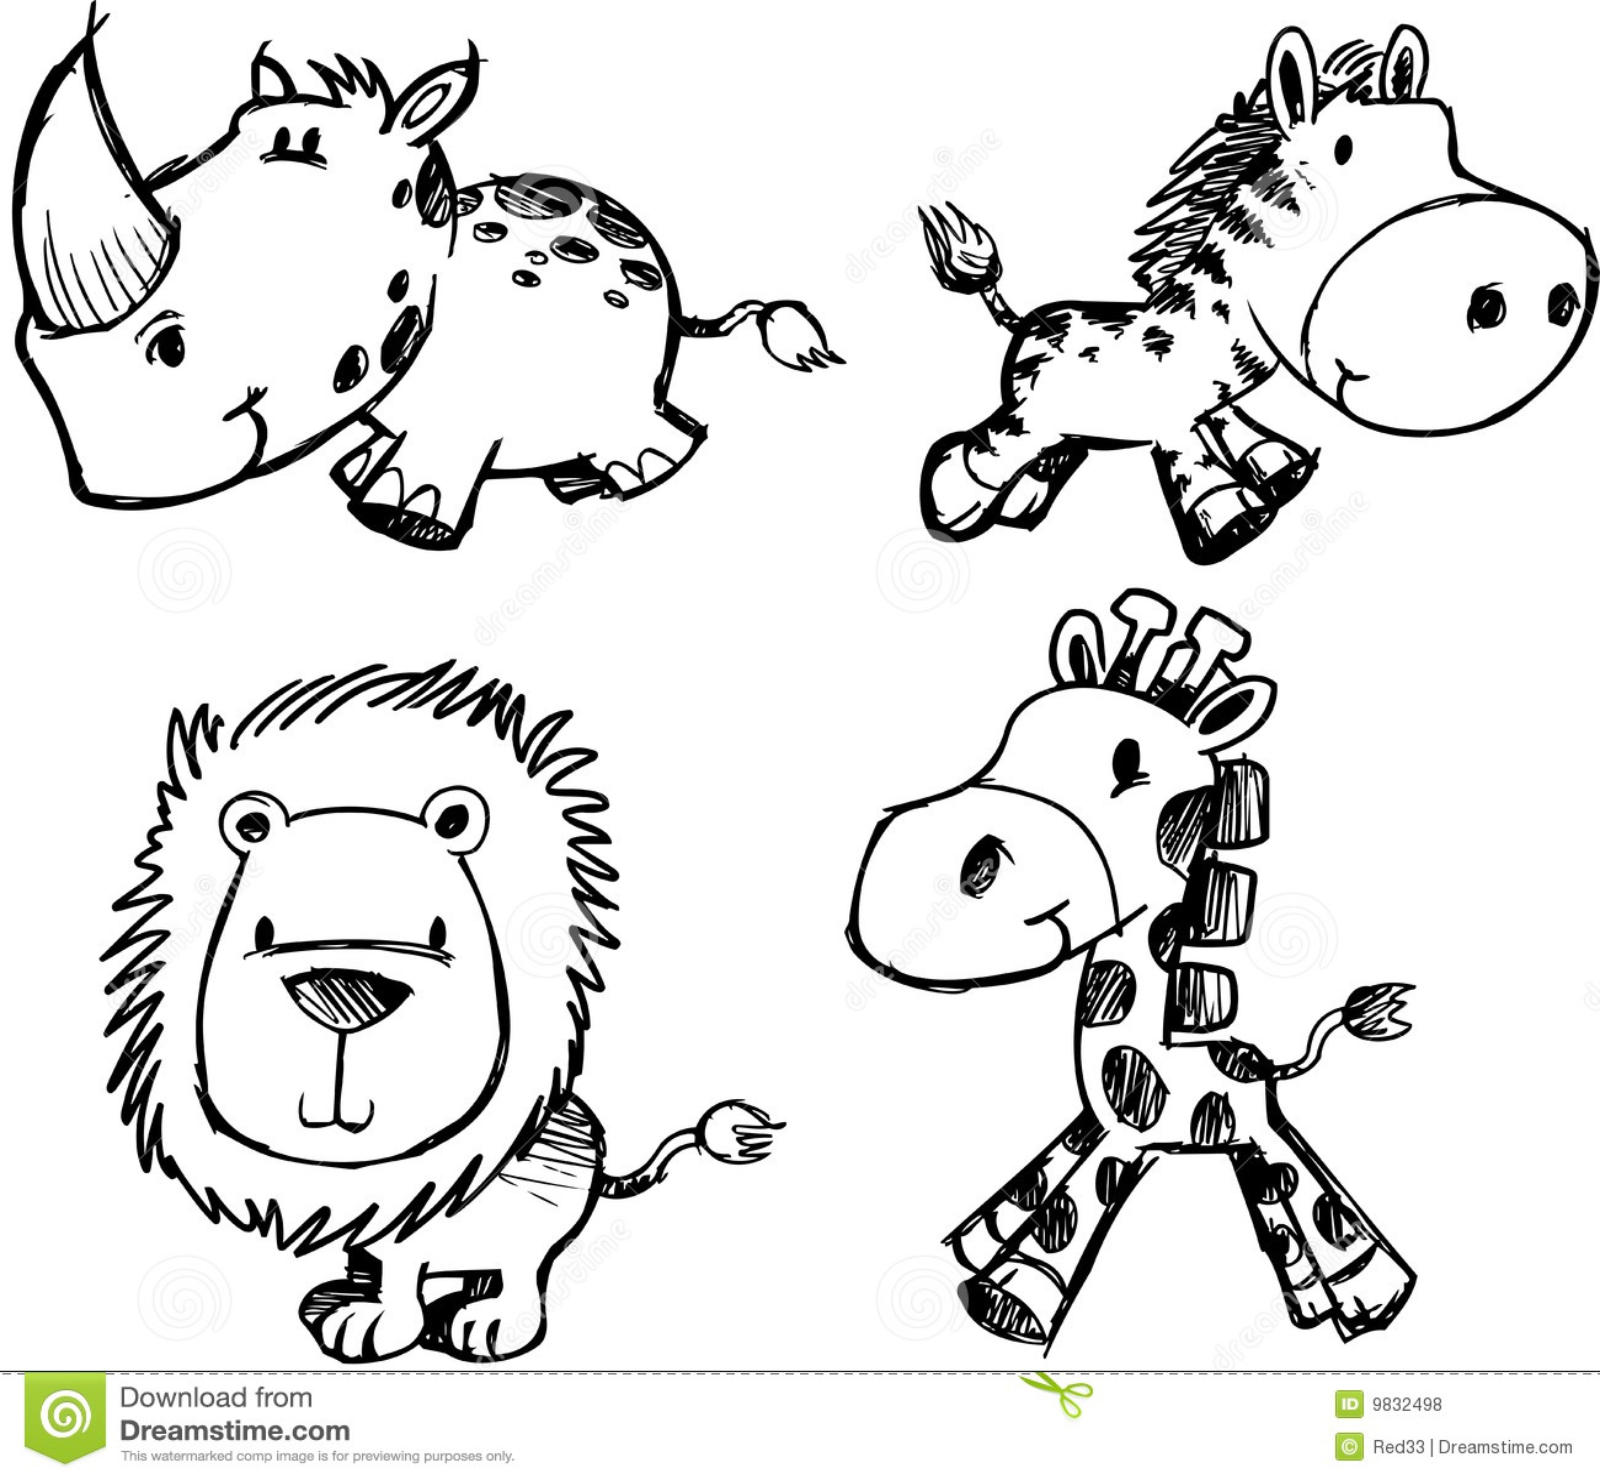 Royalty Free Stock Photos: Sketch Animal Set Vector